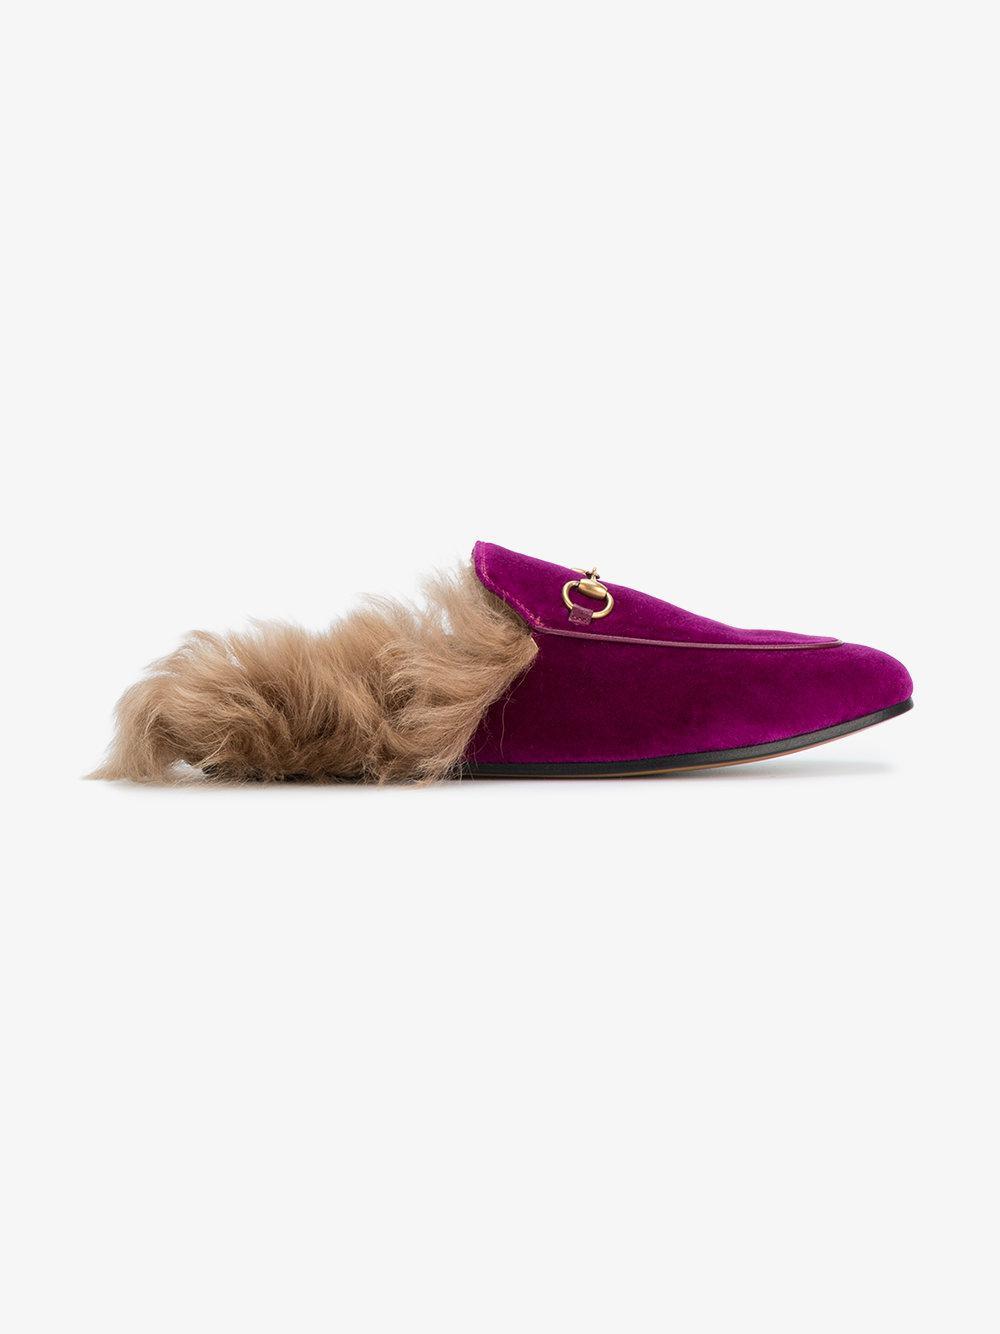 Purple Princetown Fur lined Leather Mules - Pink & Purple Gucci MomuEk